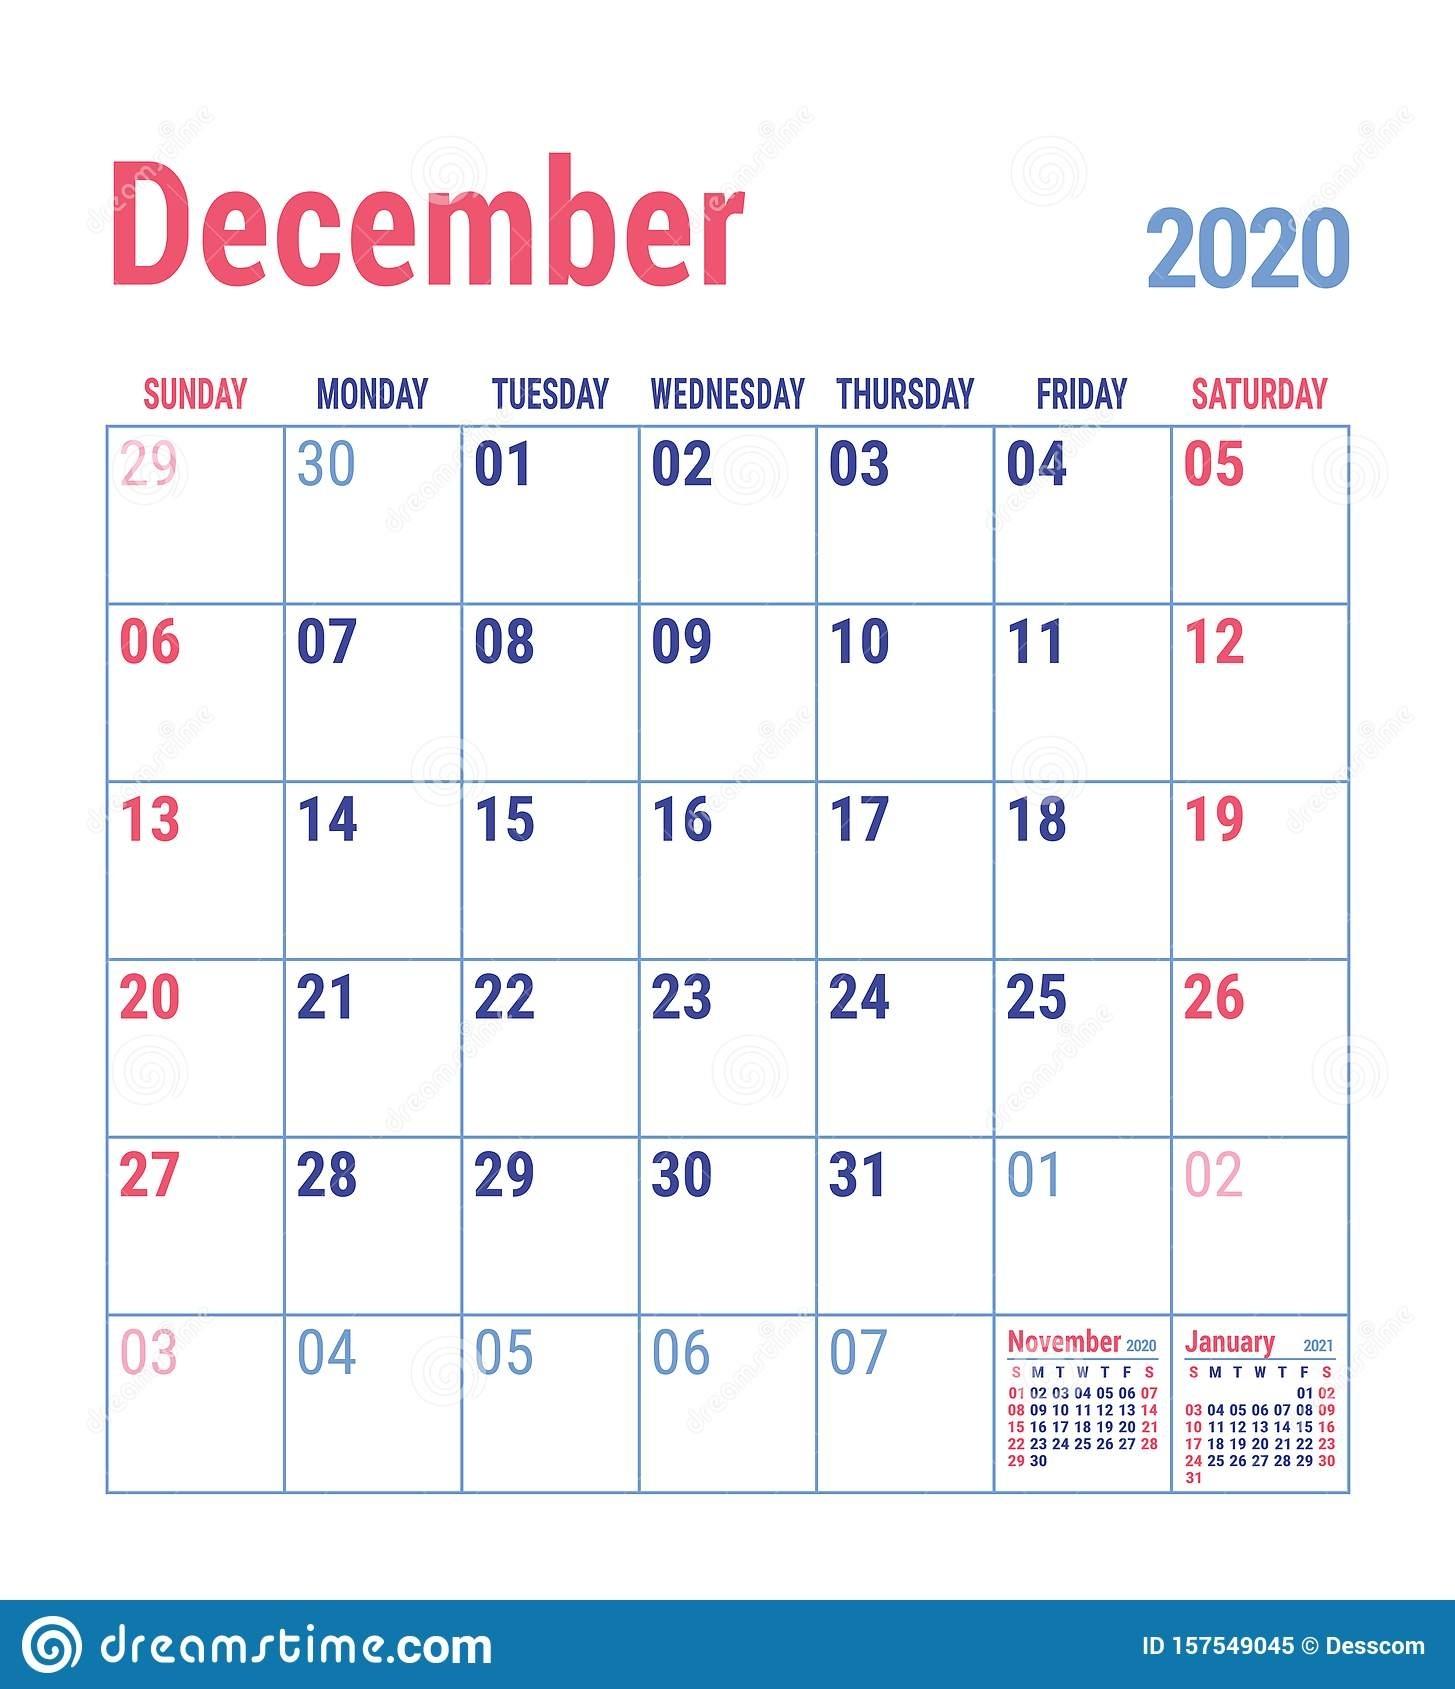 Календарь Декабрь 2020 Года Шаблон Календаря На Английском Сетка Декабря 2021